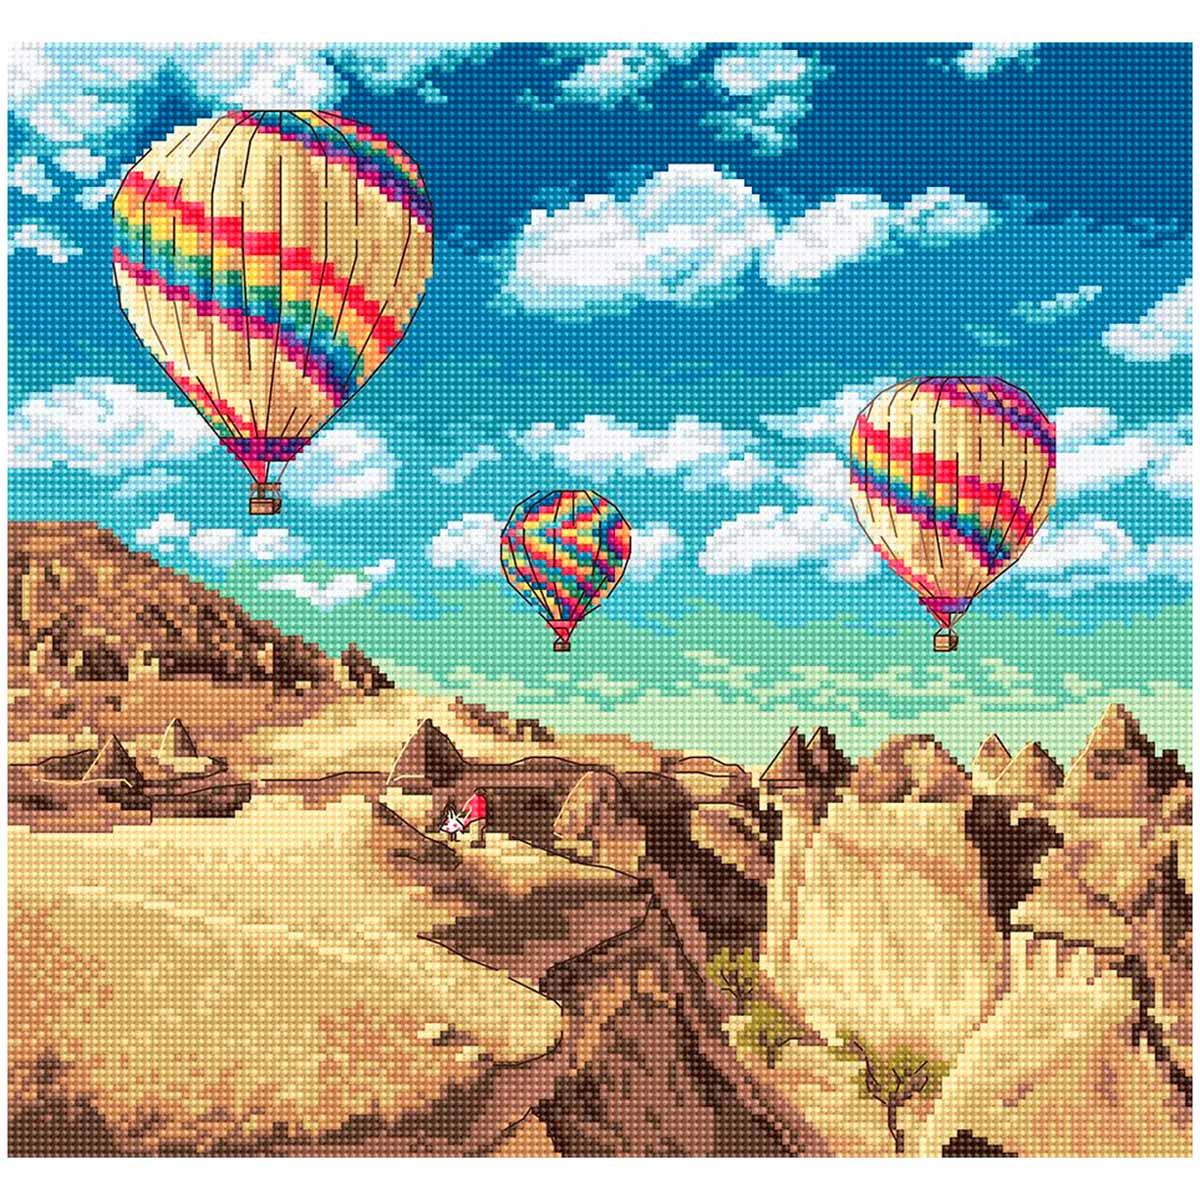 Leti961 Набор для вышивания LetiStitch 'Воздушные шары над Гранд-Каньоном' 23,5*25см